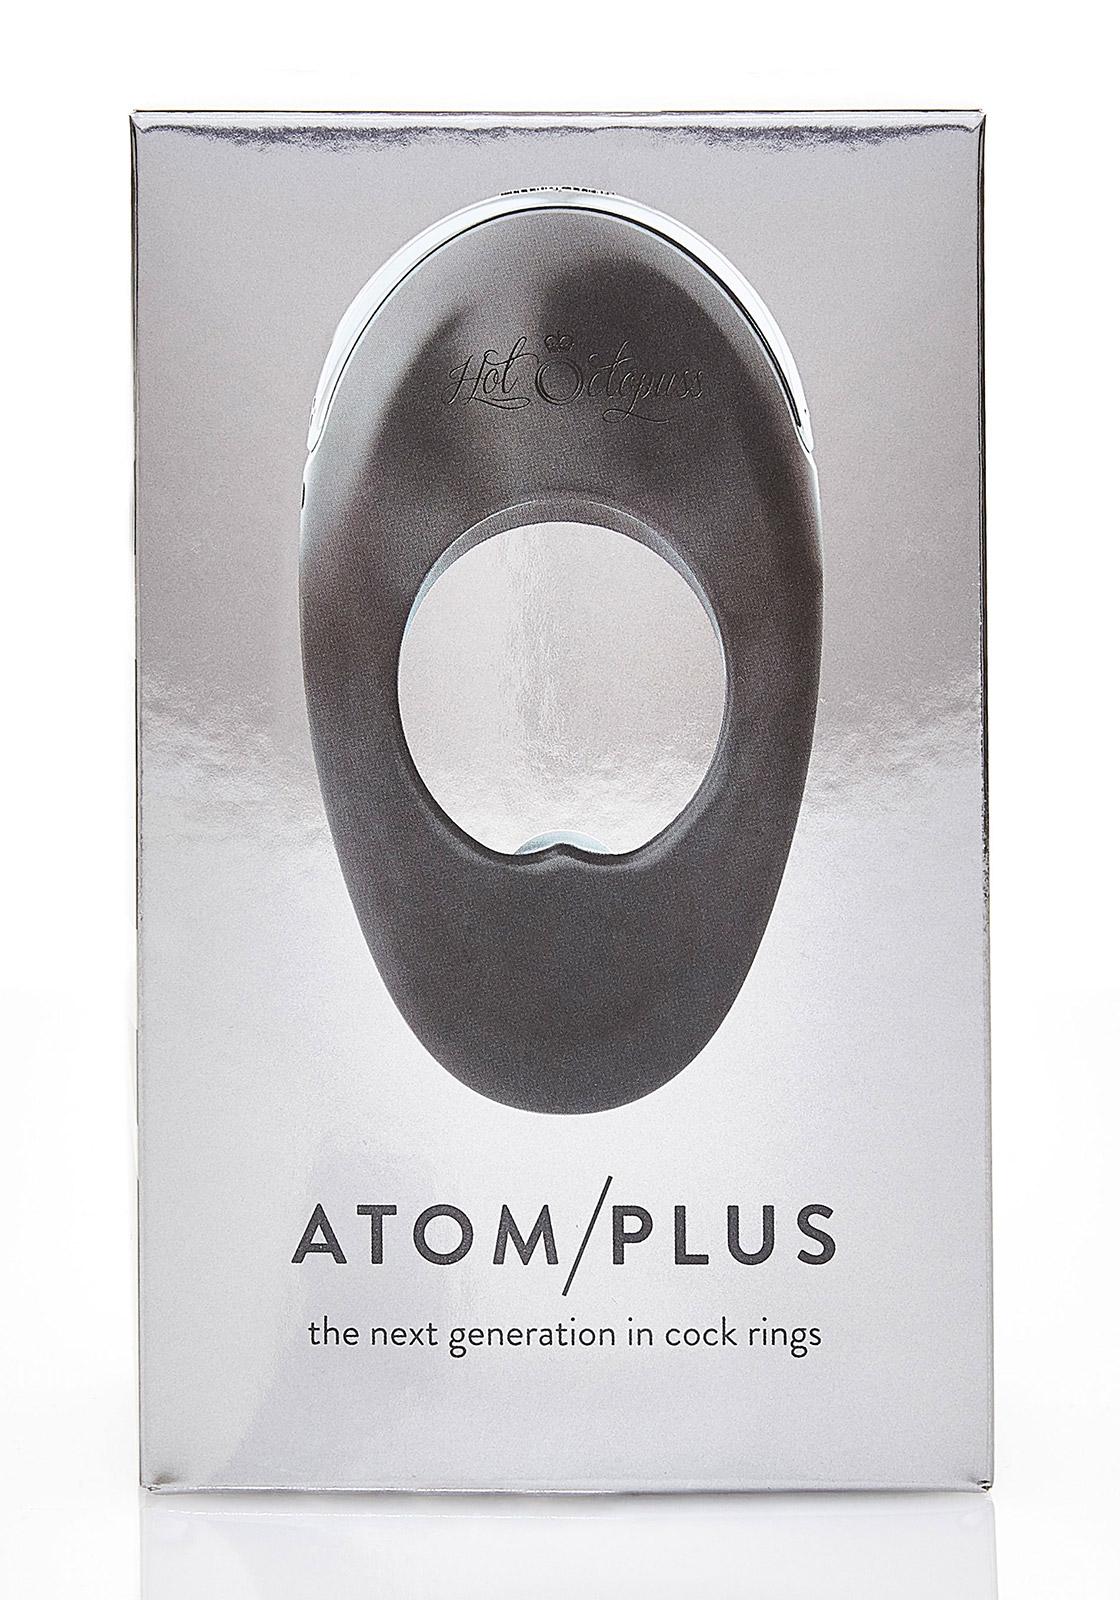 Hot Octopuss: Atom Plus Cockring